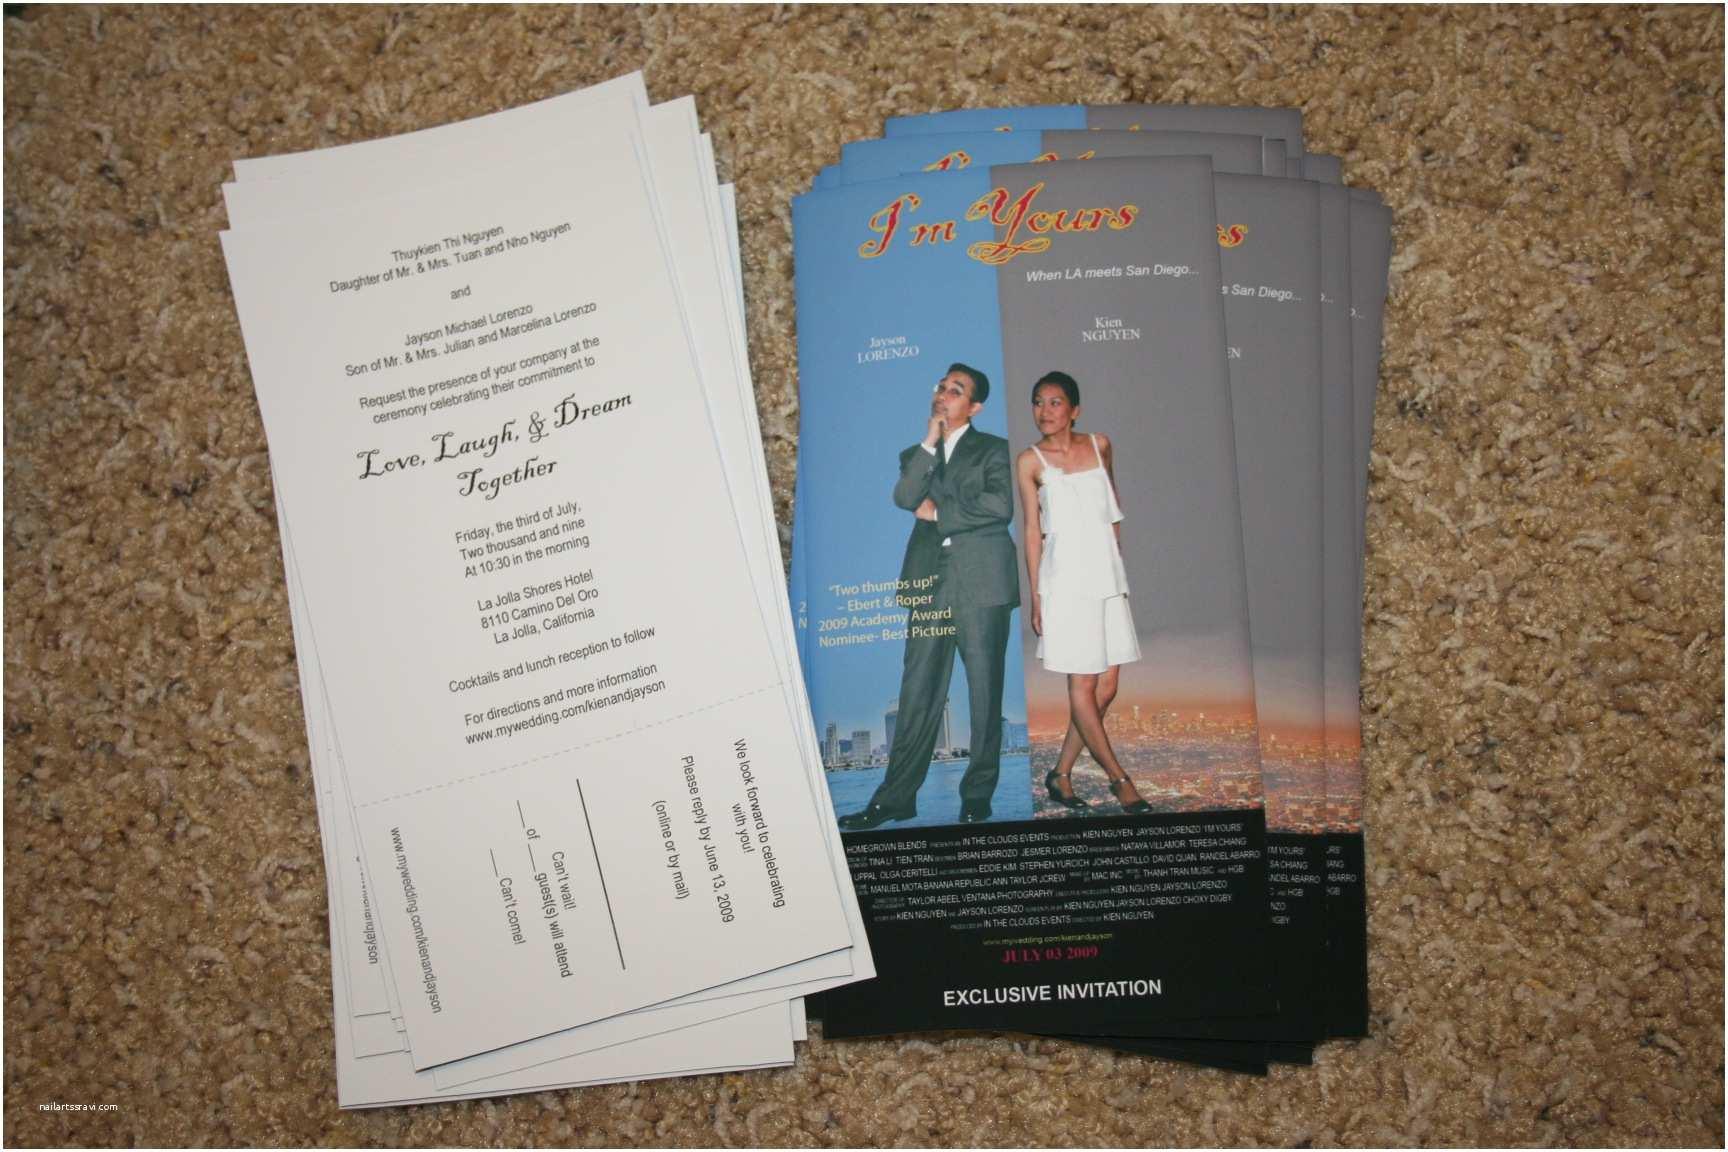 Movie Ticket Wedding Invitations Awe Inspiring Movie Ticket Wedding Invitations